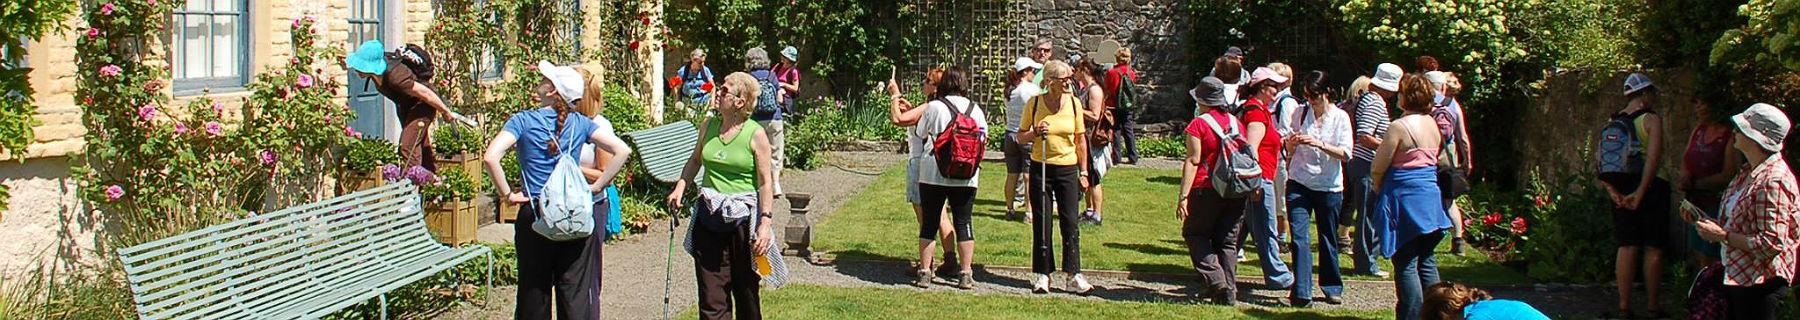 Tourists visiting Celbridge, Kildare